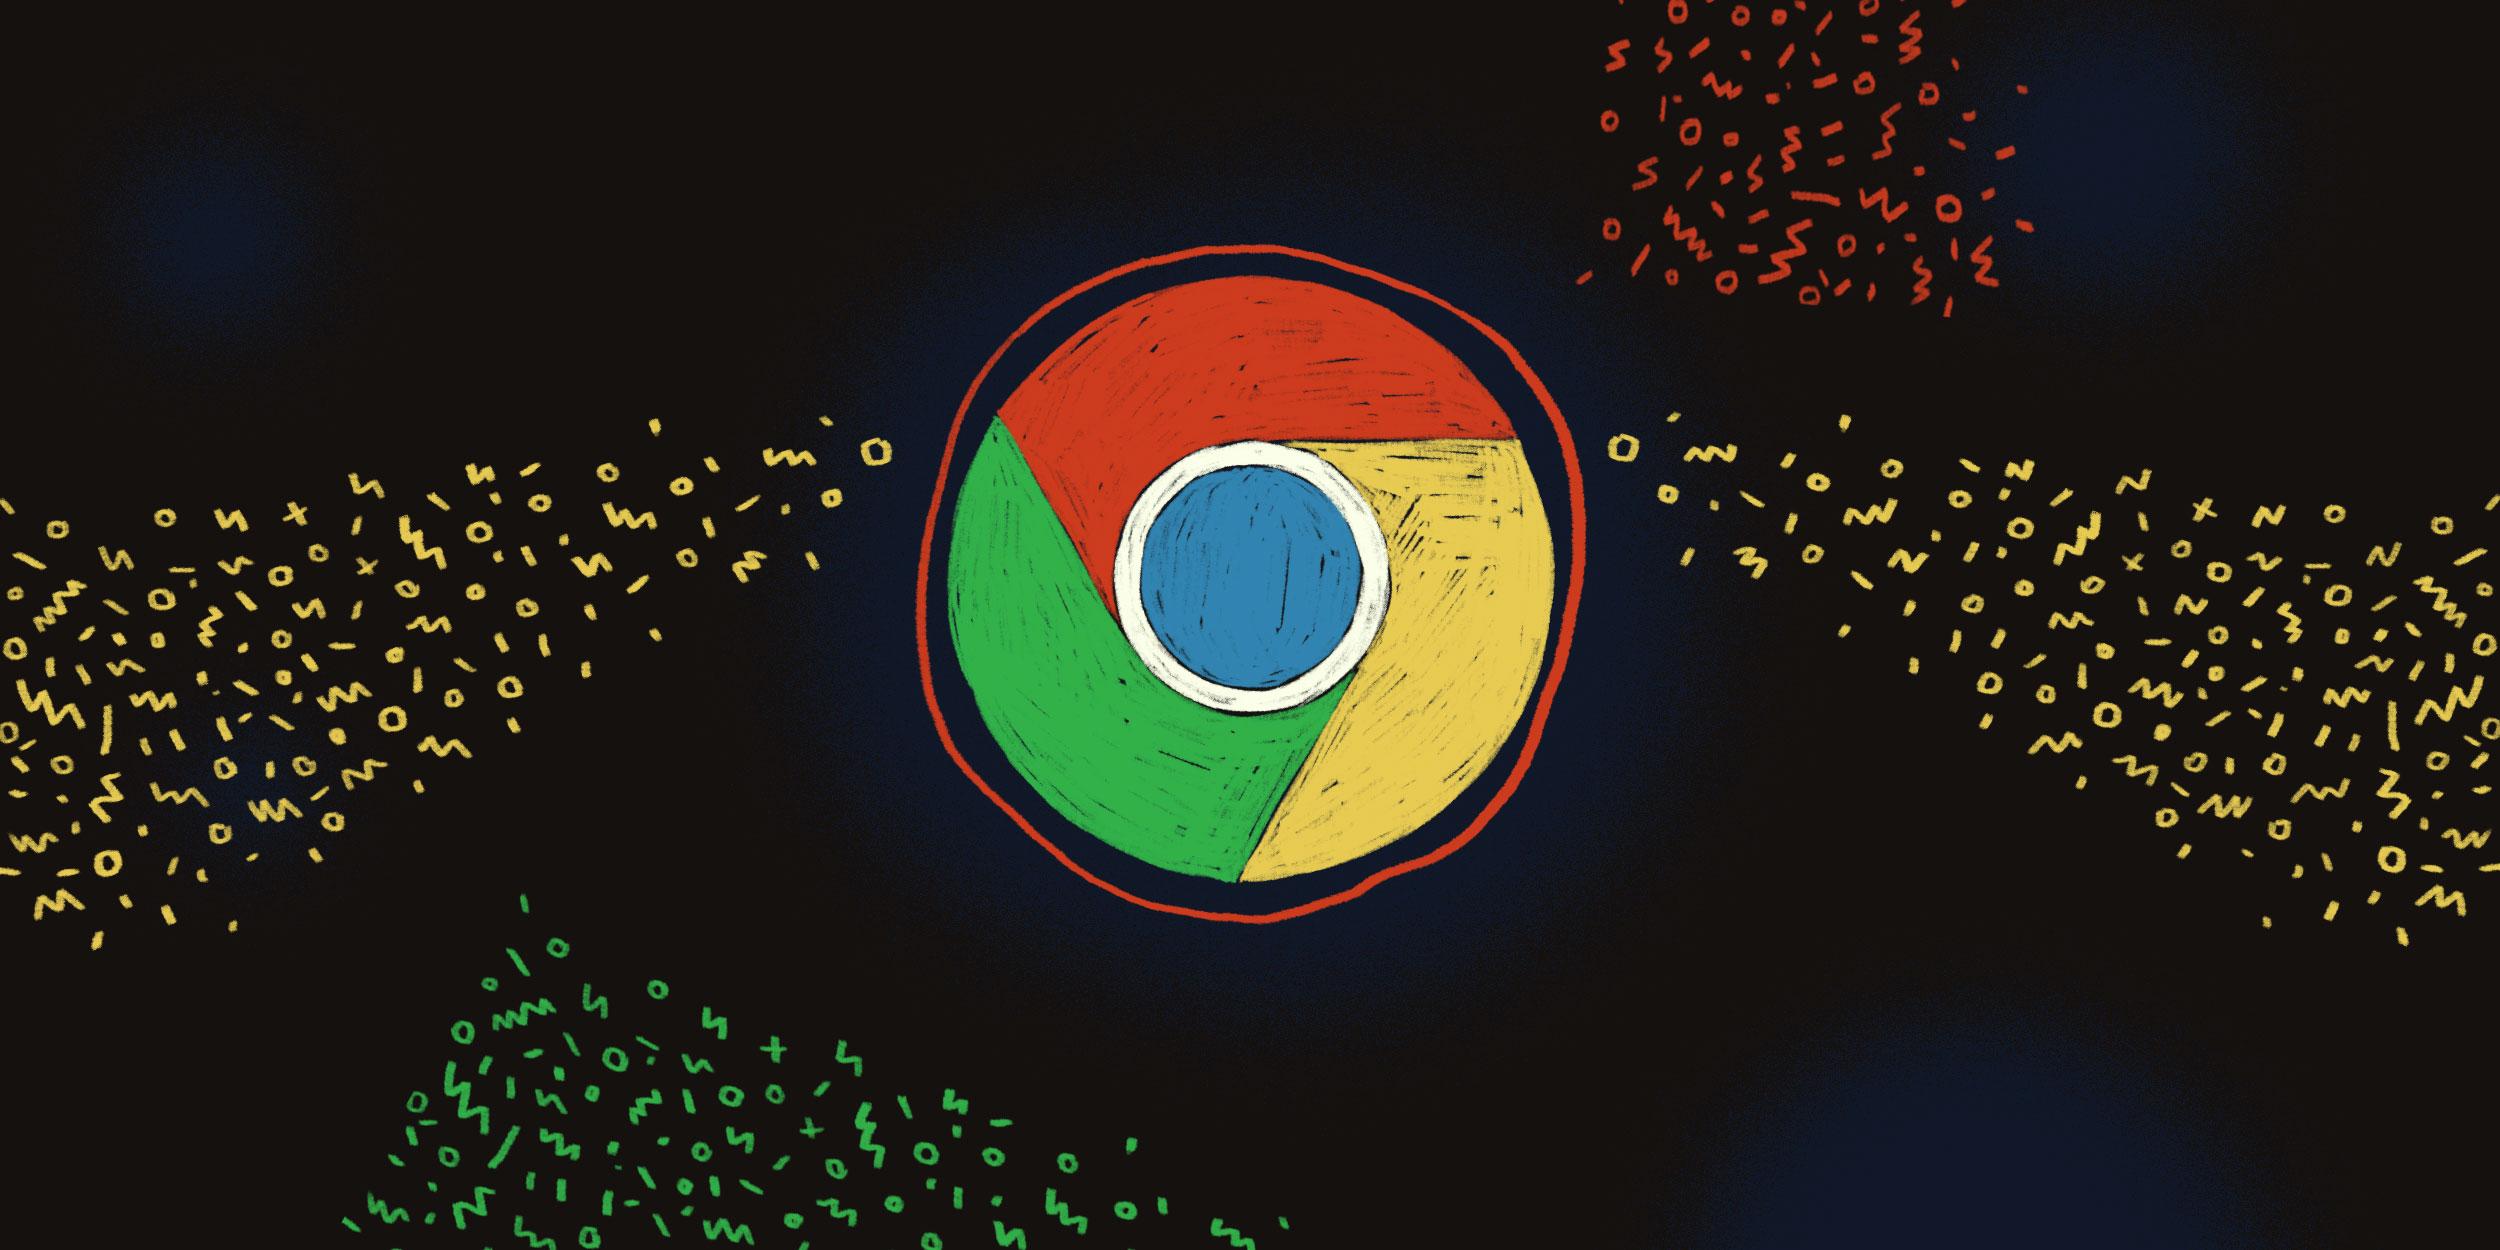 Chrome занимает много оперативной памяти